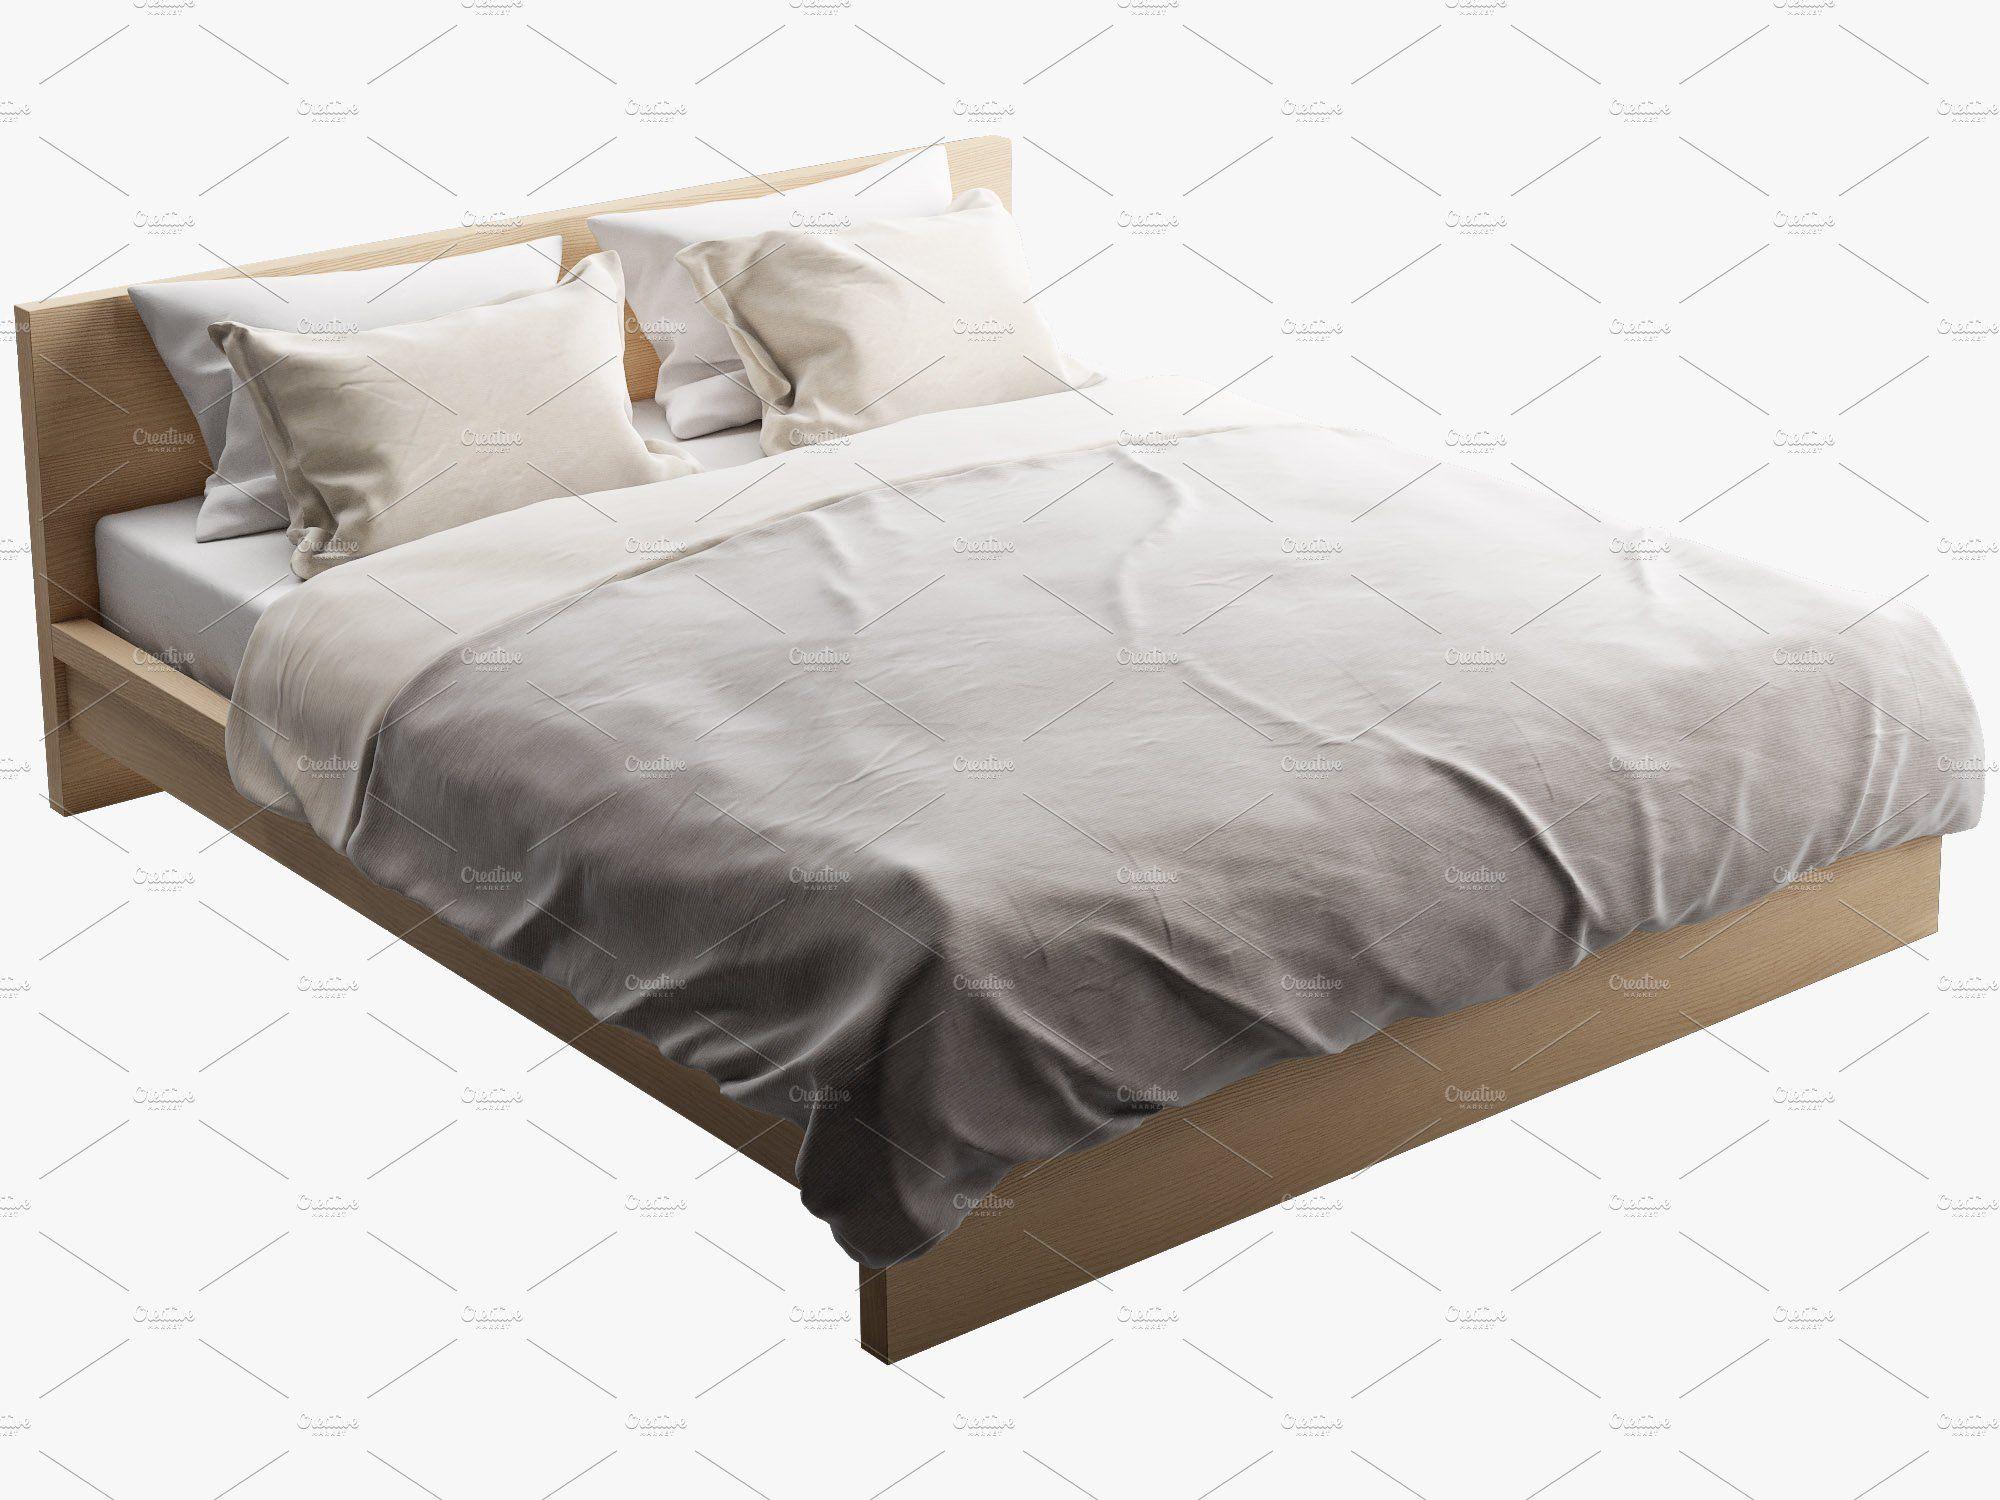 Double Bed 3d Model Bed Bed Furniture Bed Frame